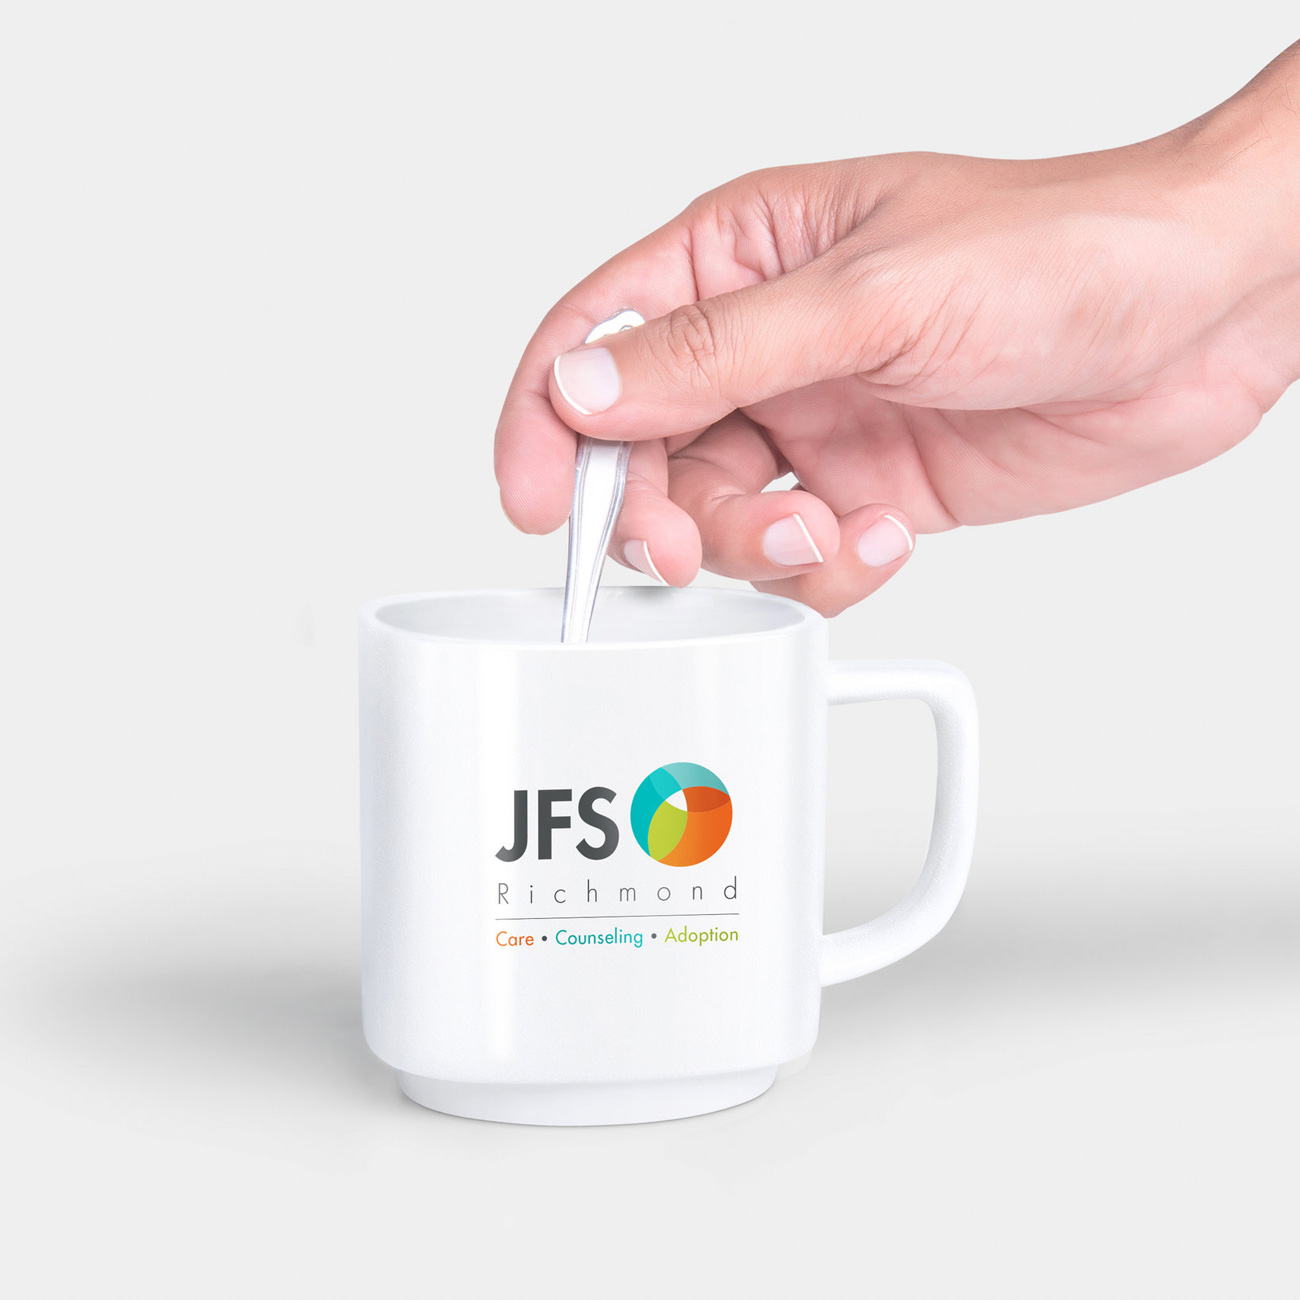 JFS Logo on coffee mug